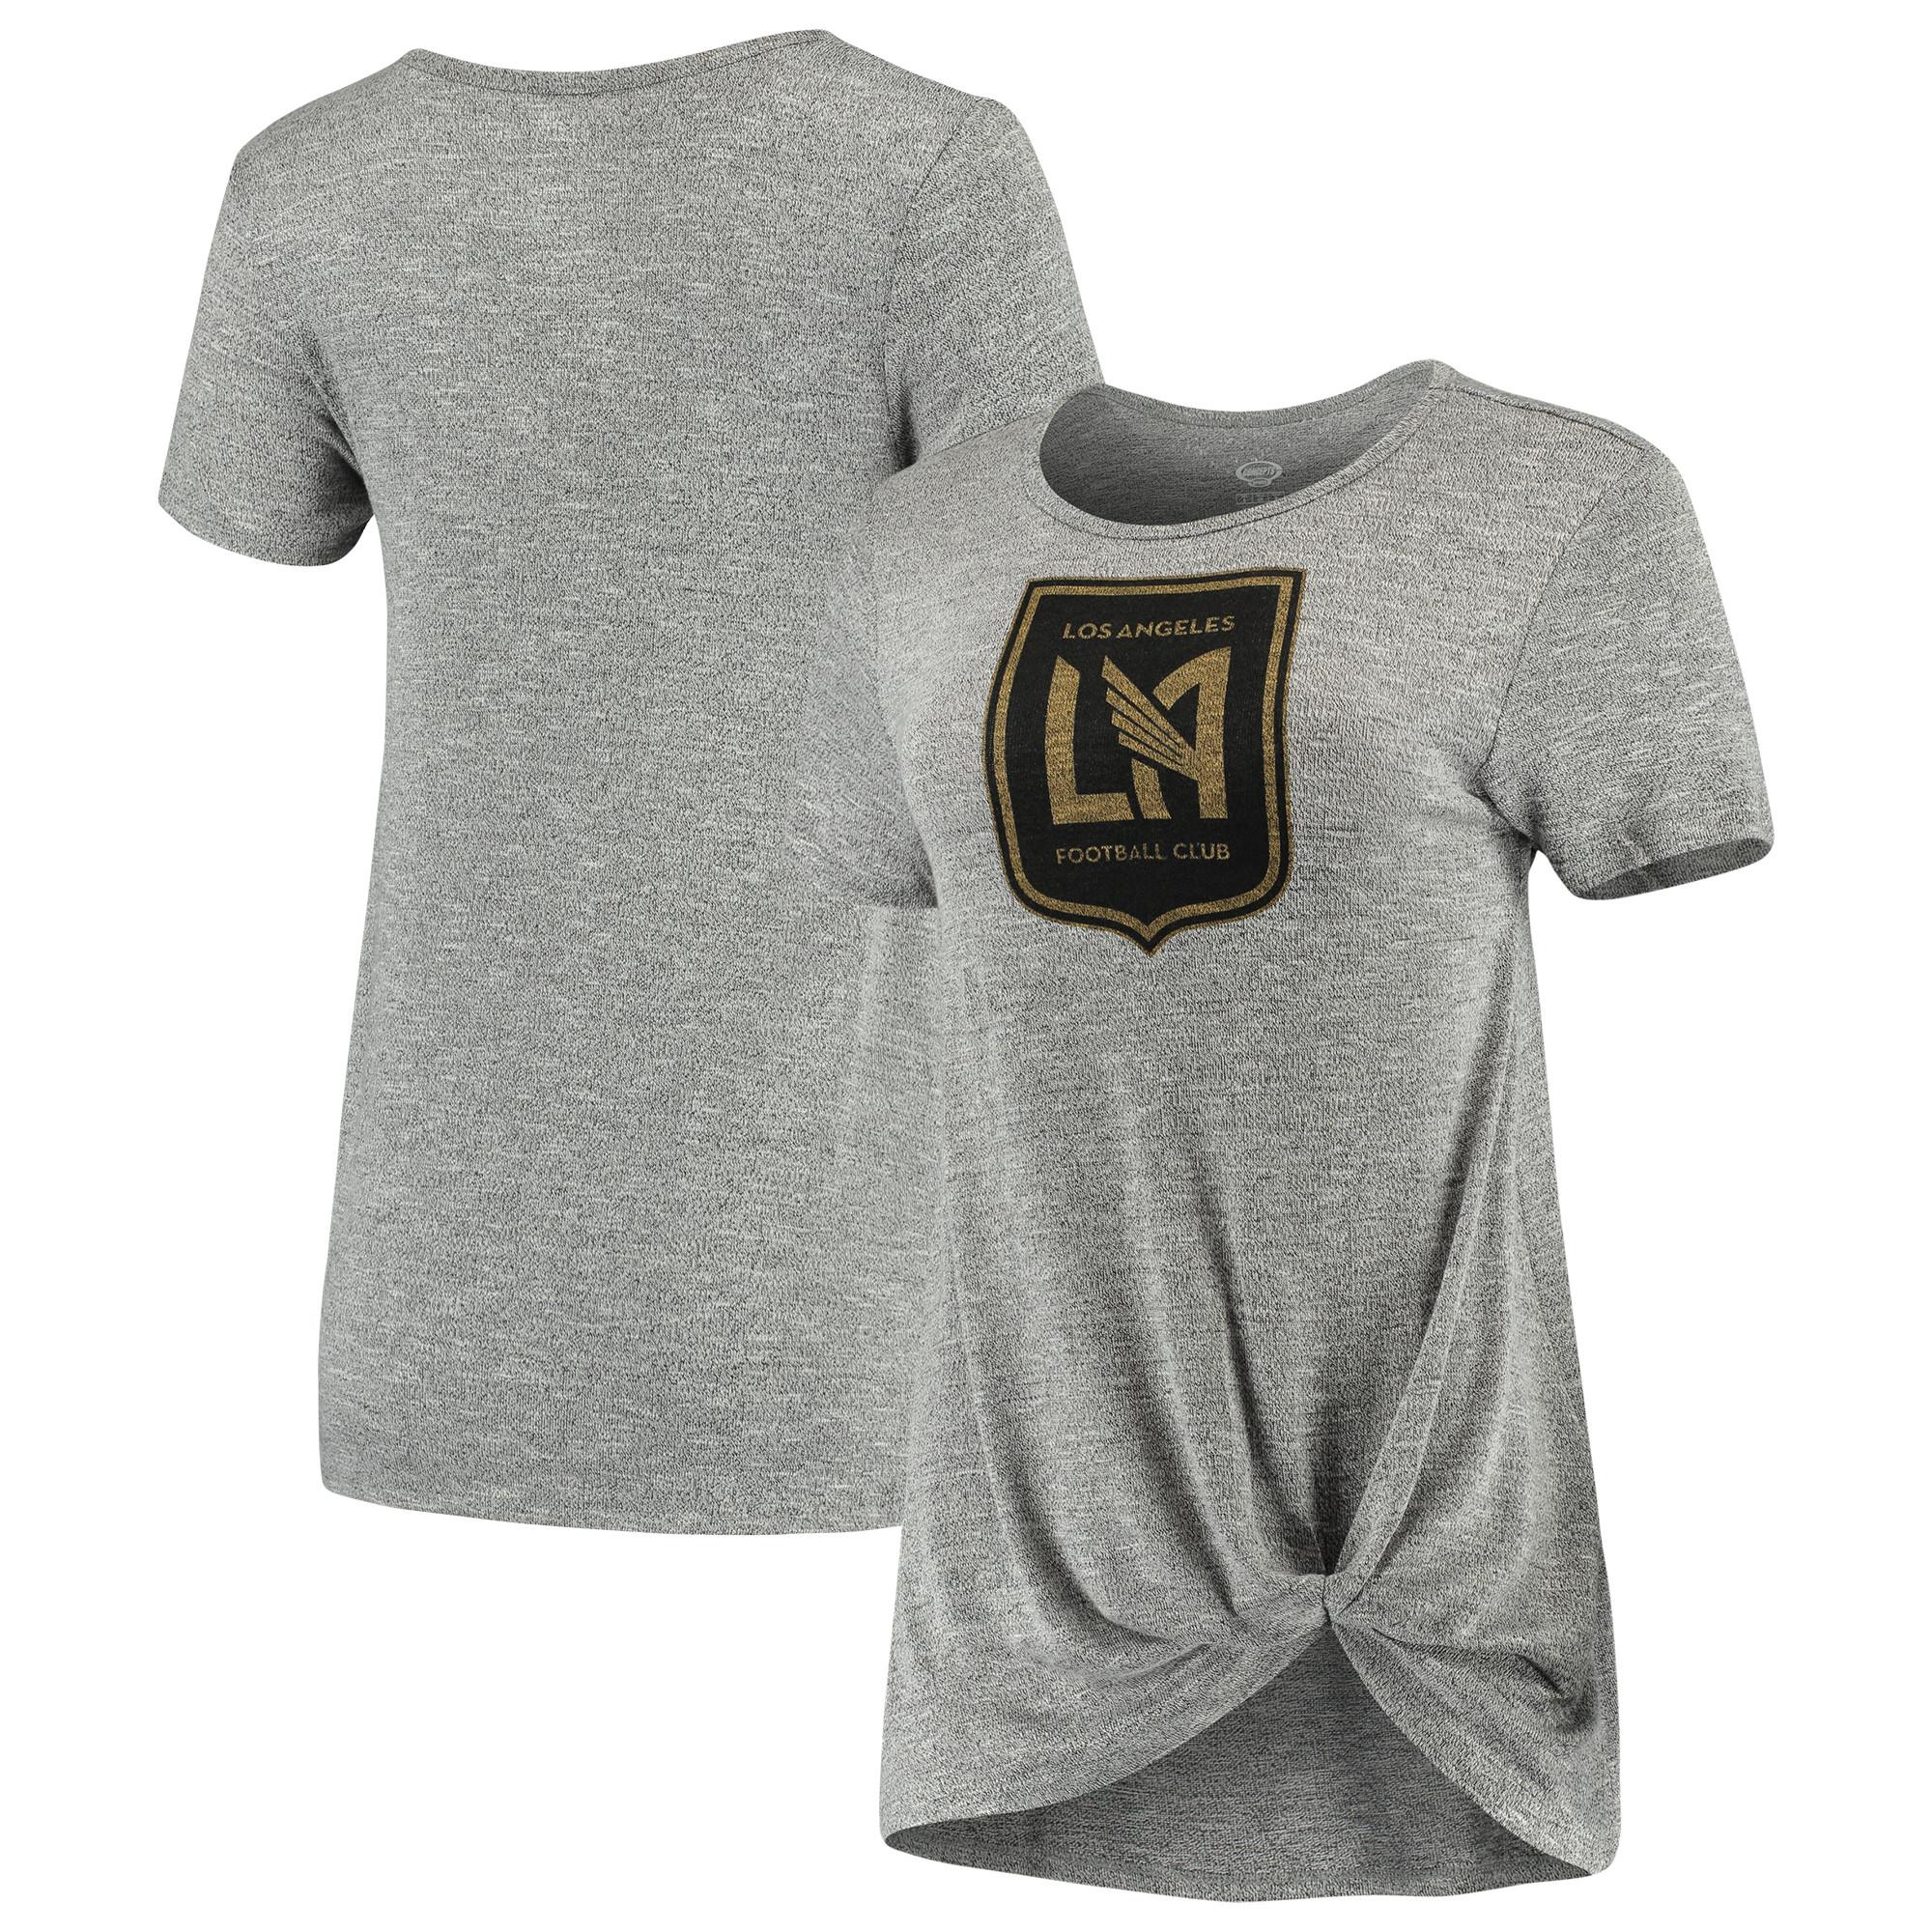 LAFC Concepts Sport Women's Layover Knot Tri-Blend T-Shirt - Gray